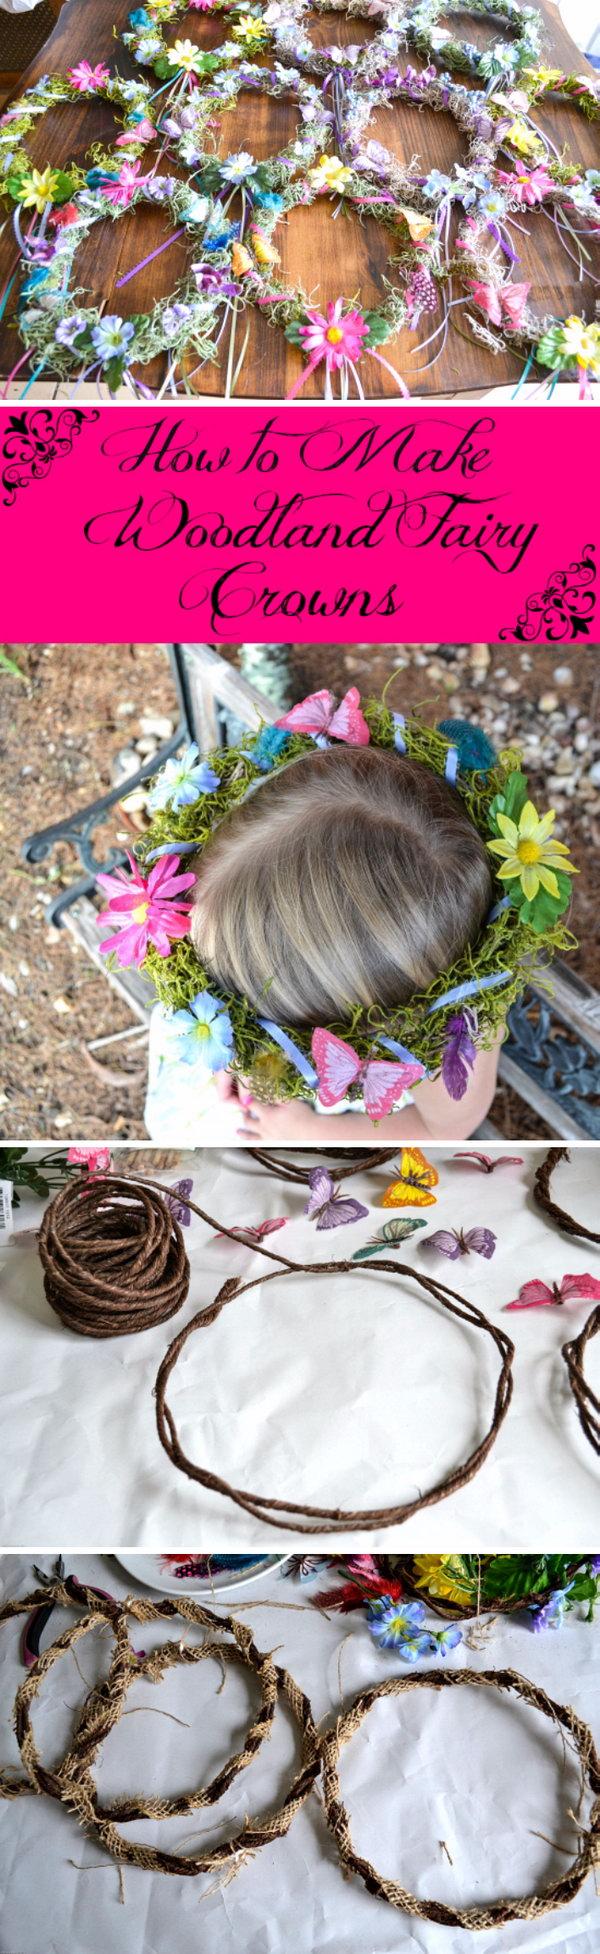 DIY Fairy Crowns.